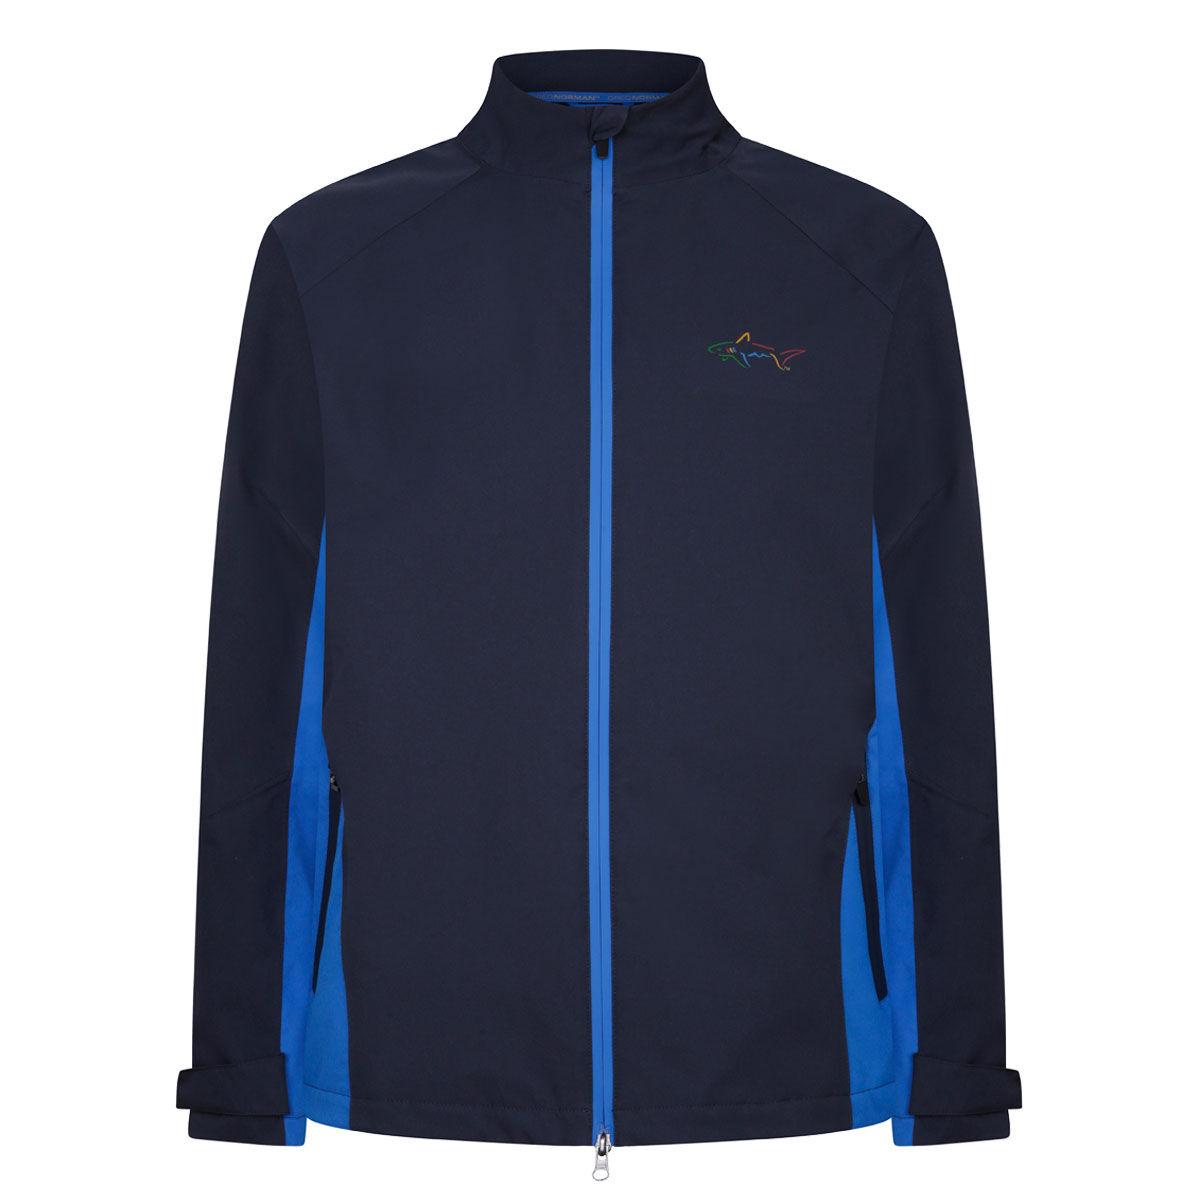 Greg Norman Dorsal Waterproof Golf Jacket, Mens, Navy/blue, Large   American Golf